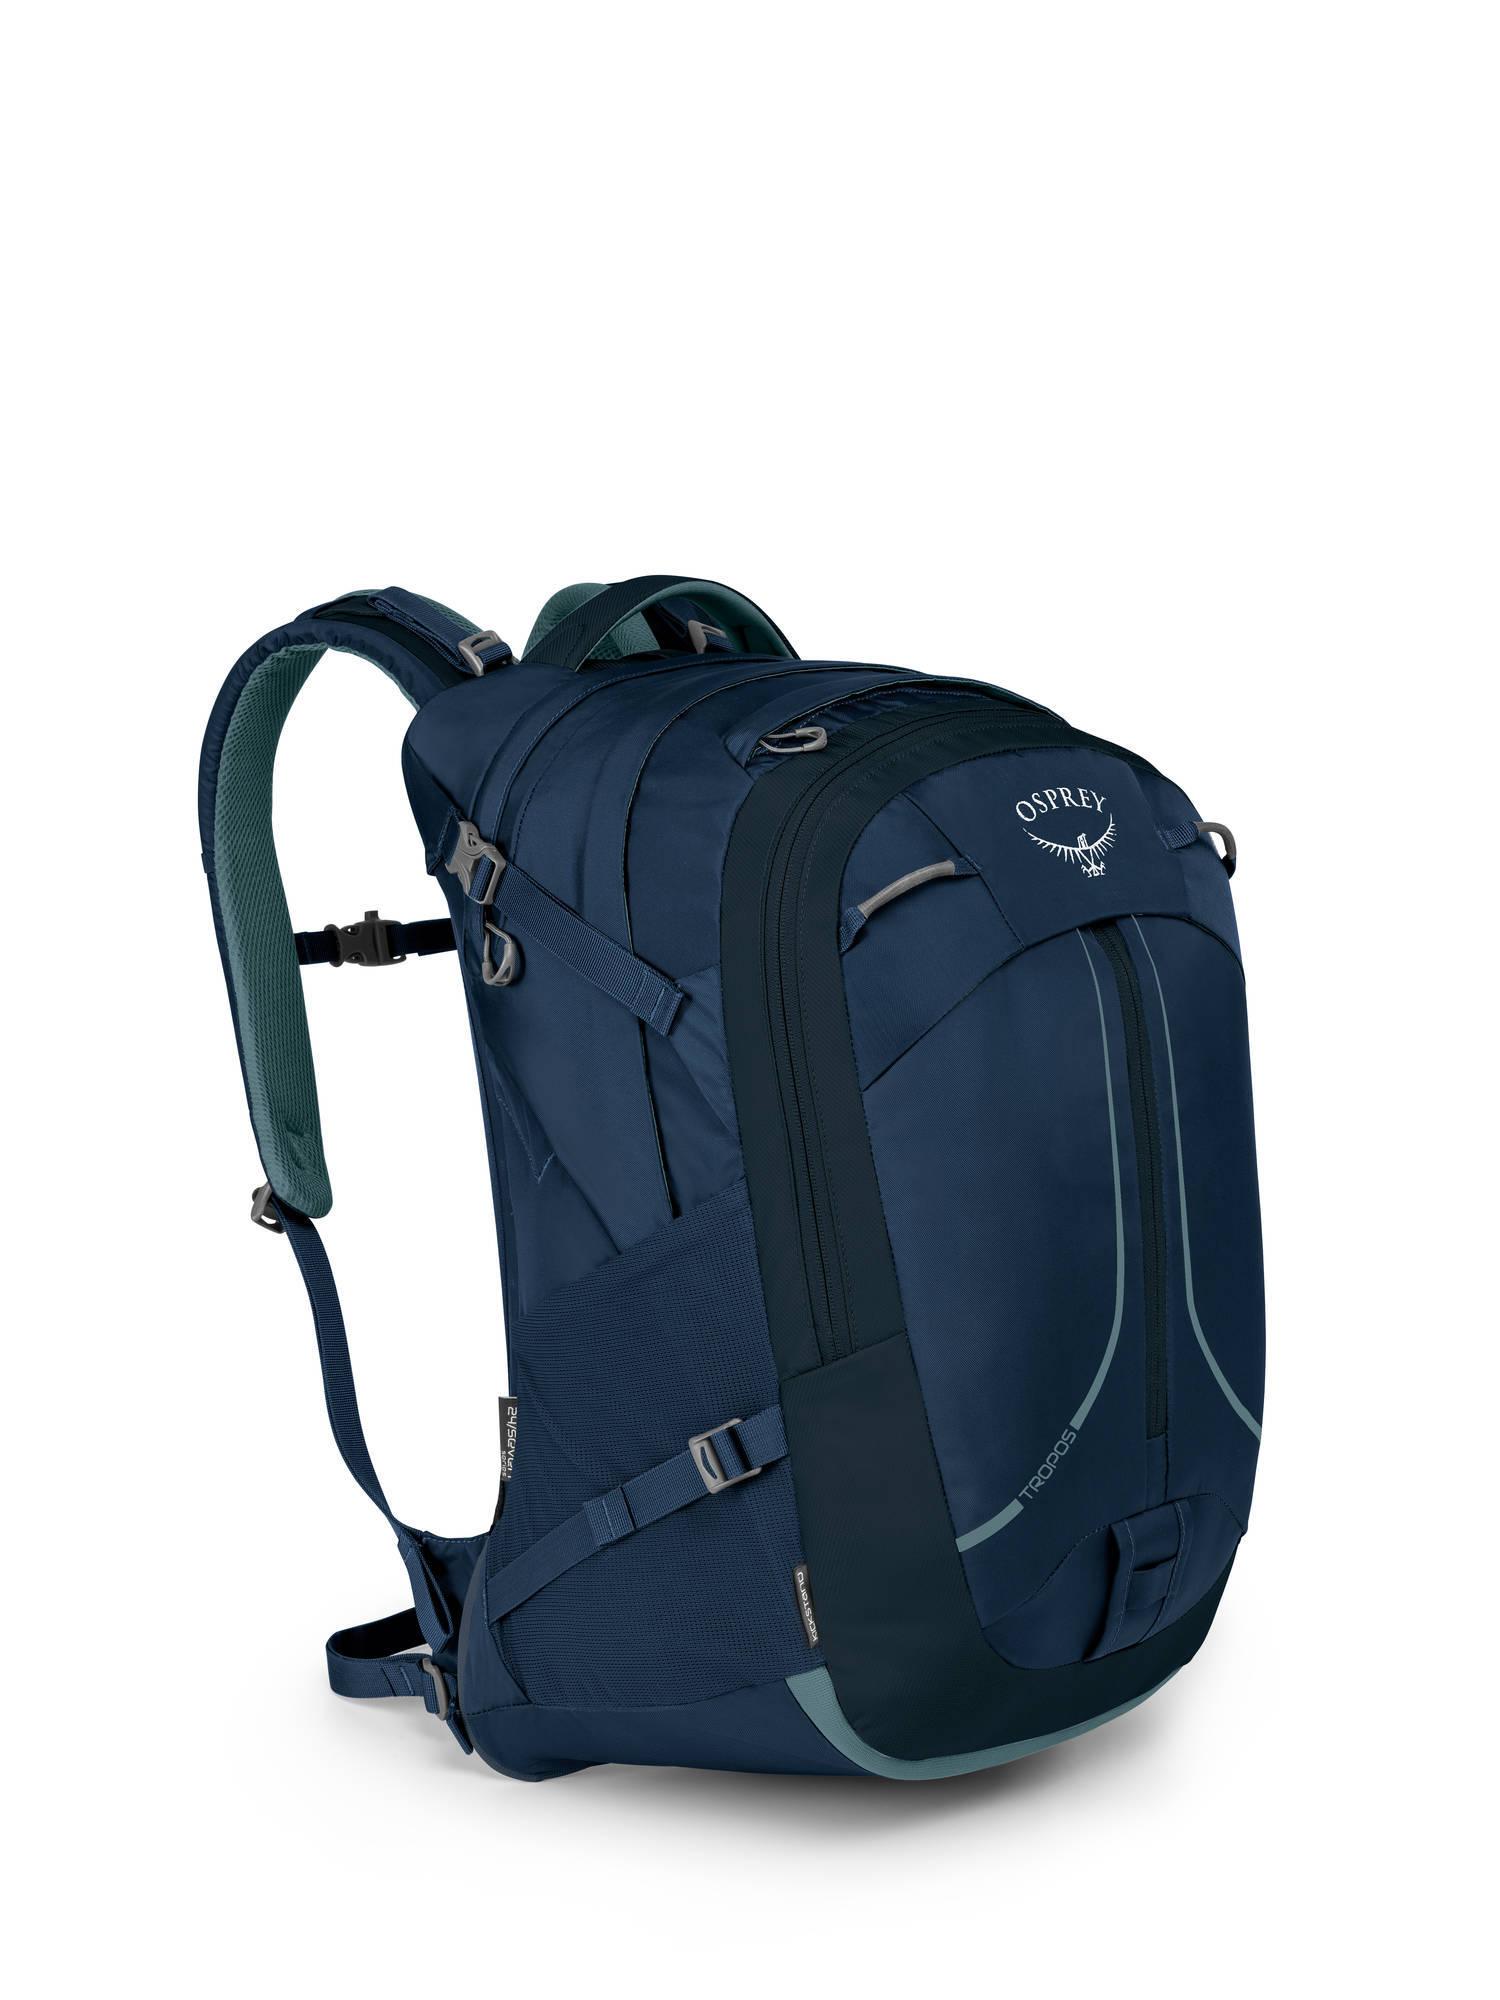 3cfd09b61f1a Городские рюкзаки Рюкзак городской Osprey Tropos 32 Navy Blue  Tropos_F17_Side_Navy_Blue_web.jpg